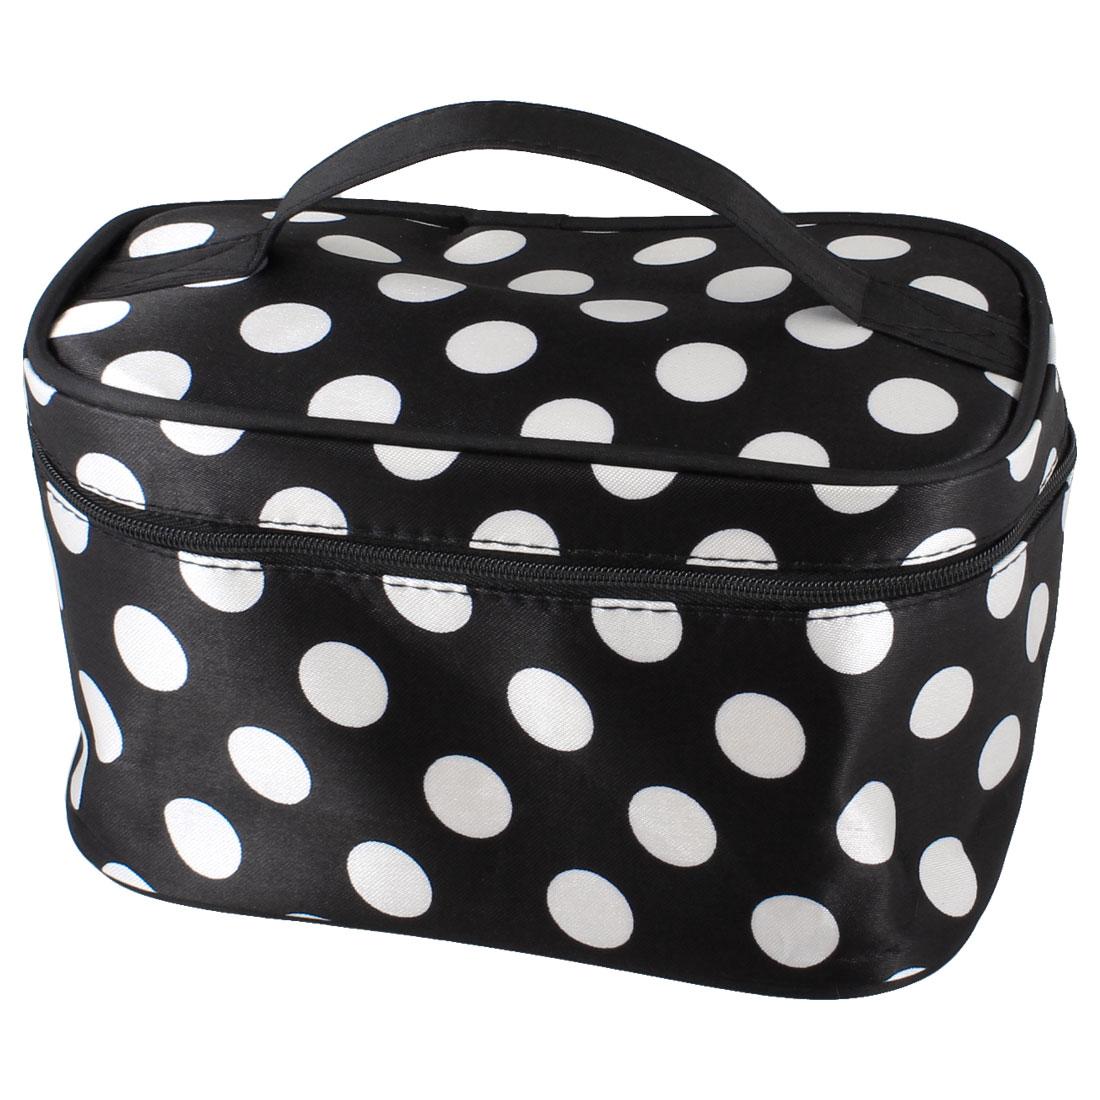 Zipper Closure White Dots Pattern Black Cosmetic Hand Case Bag